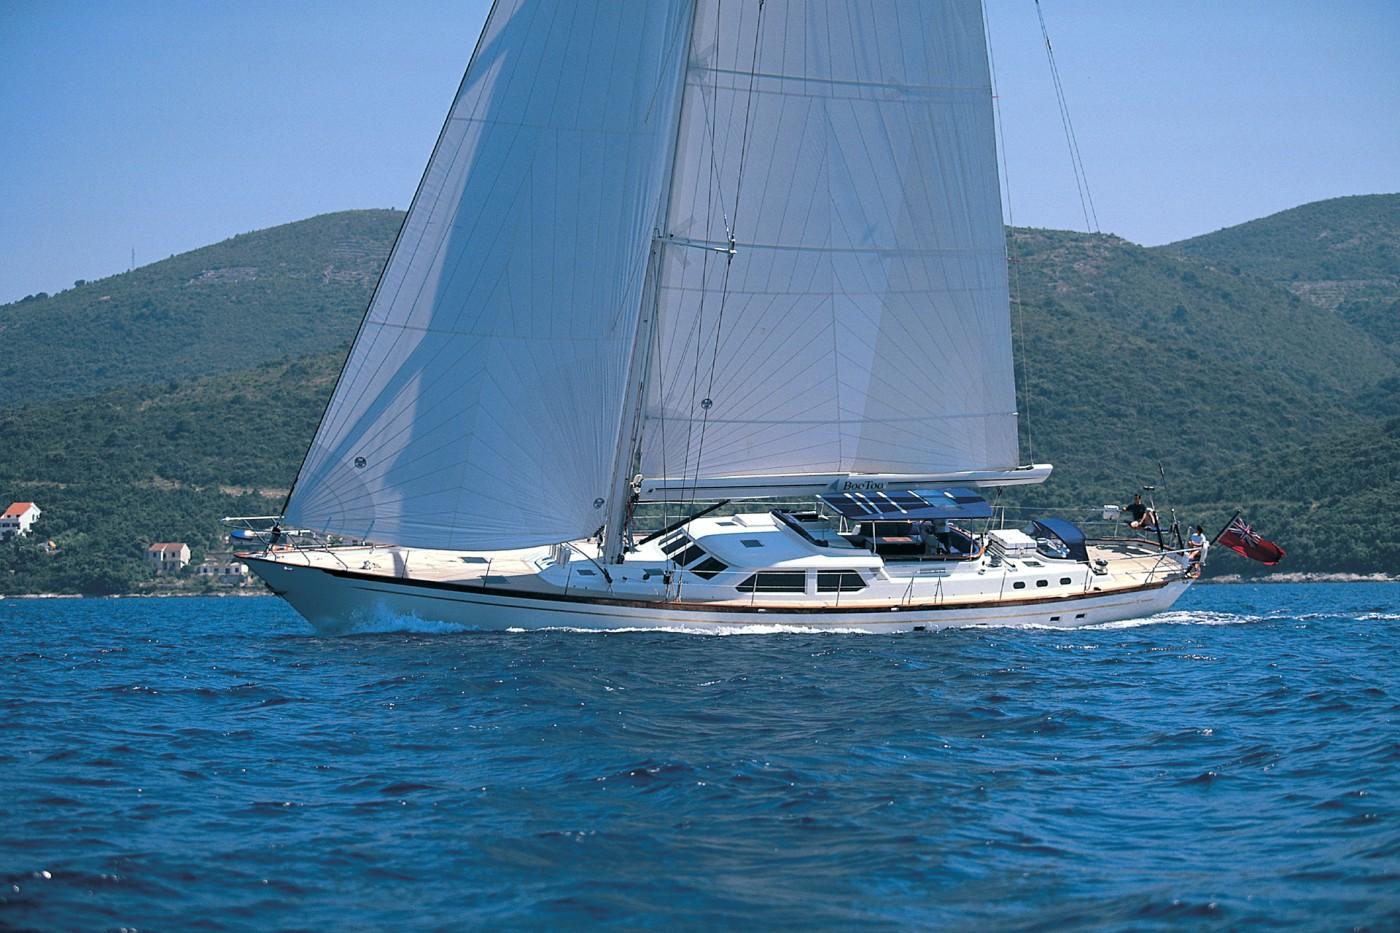 Yacht Wavelength - Sailing